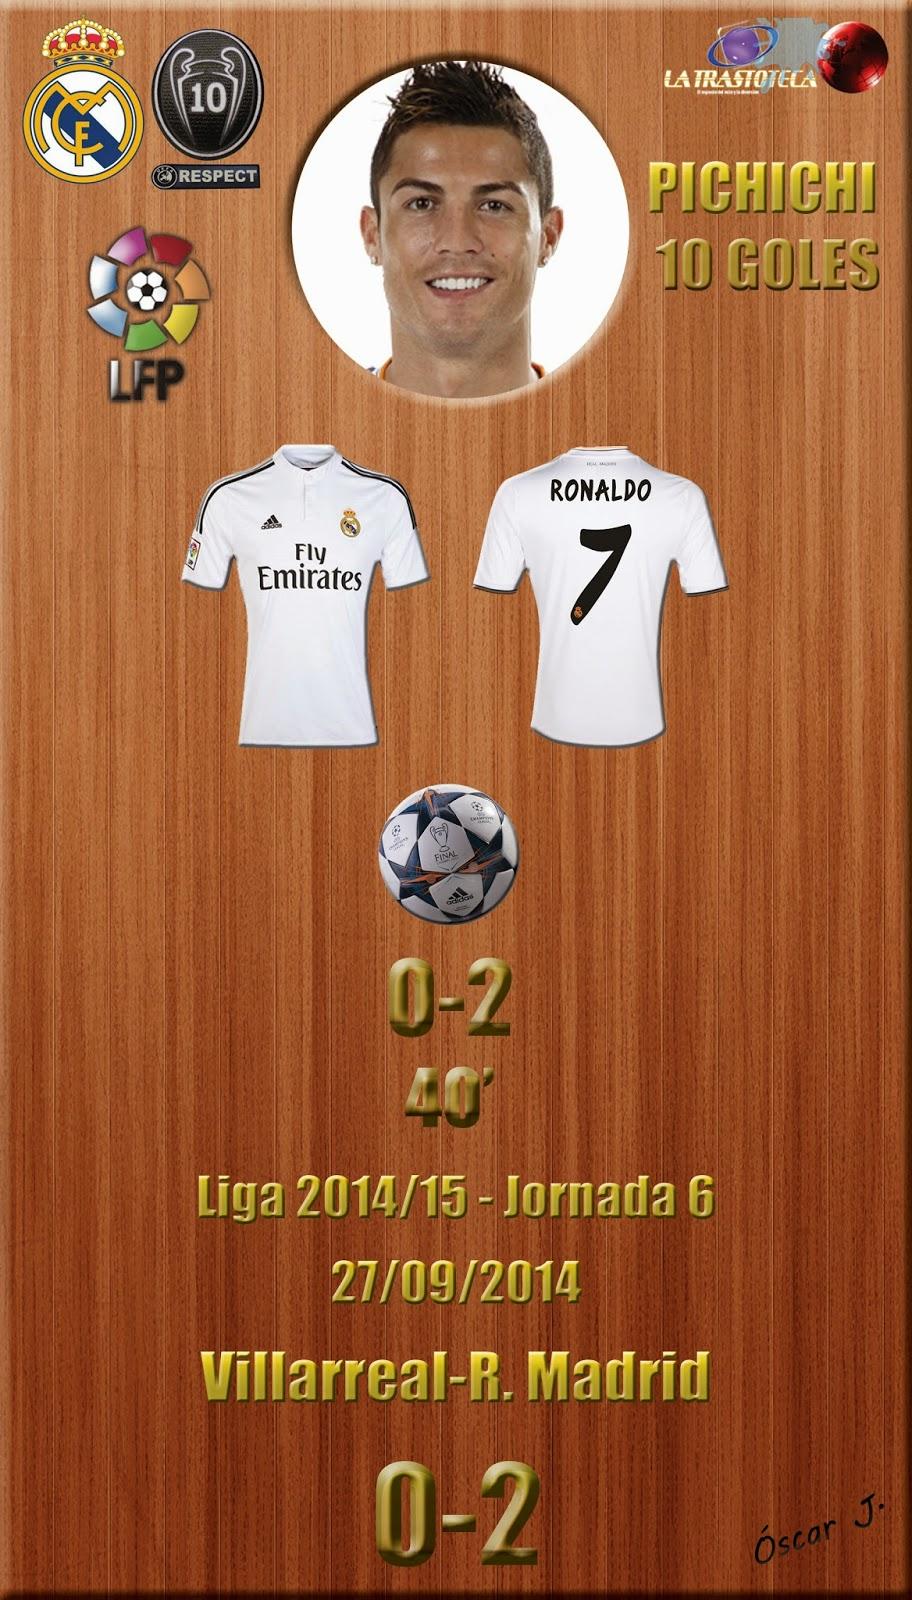 Cristiano Ronaldo (0-2) - Liga 2014/15. Jornada 6 (27/9/2014)